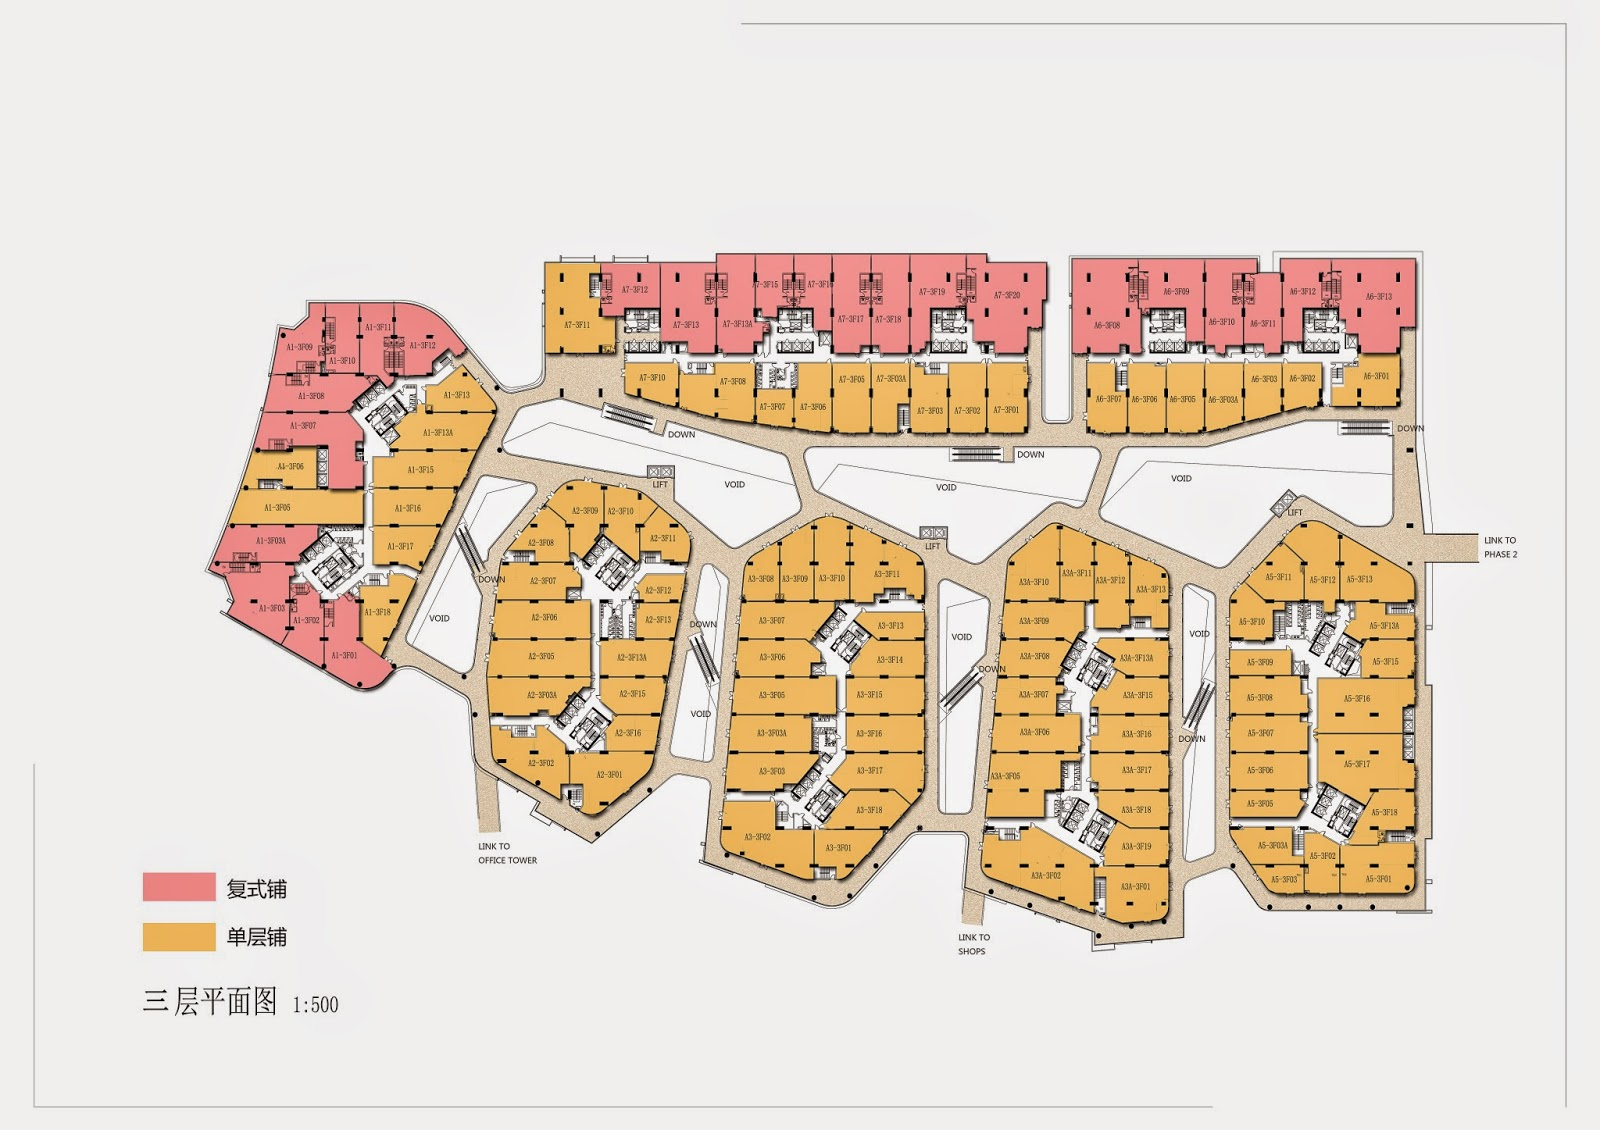 R&F Princess Cove Viva Shoplex ; Siteplan